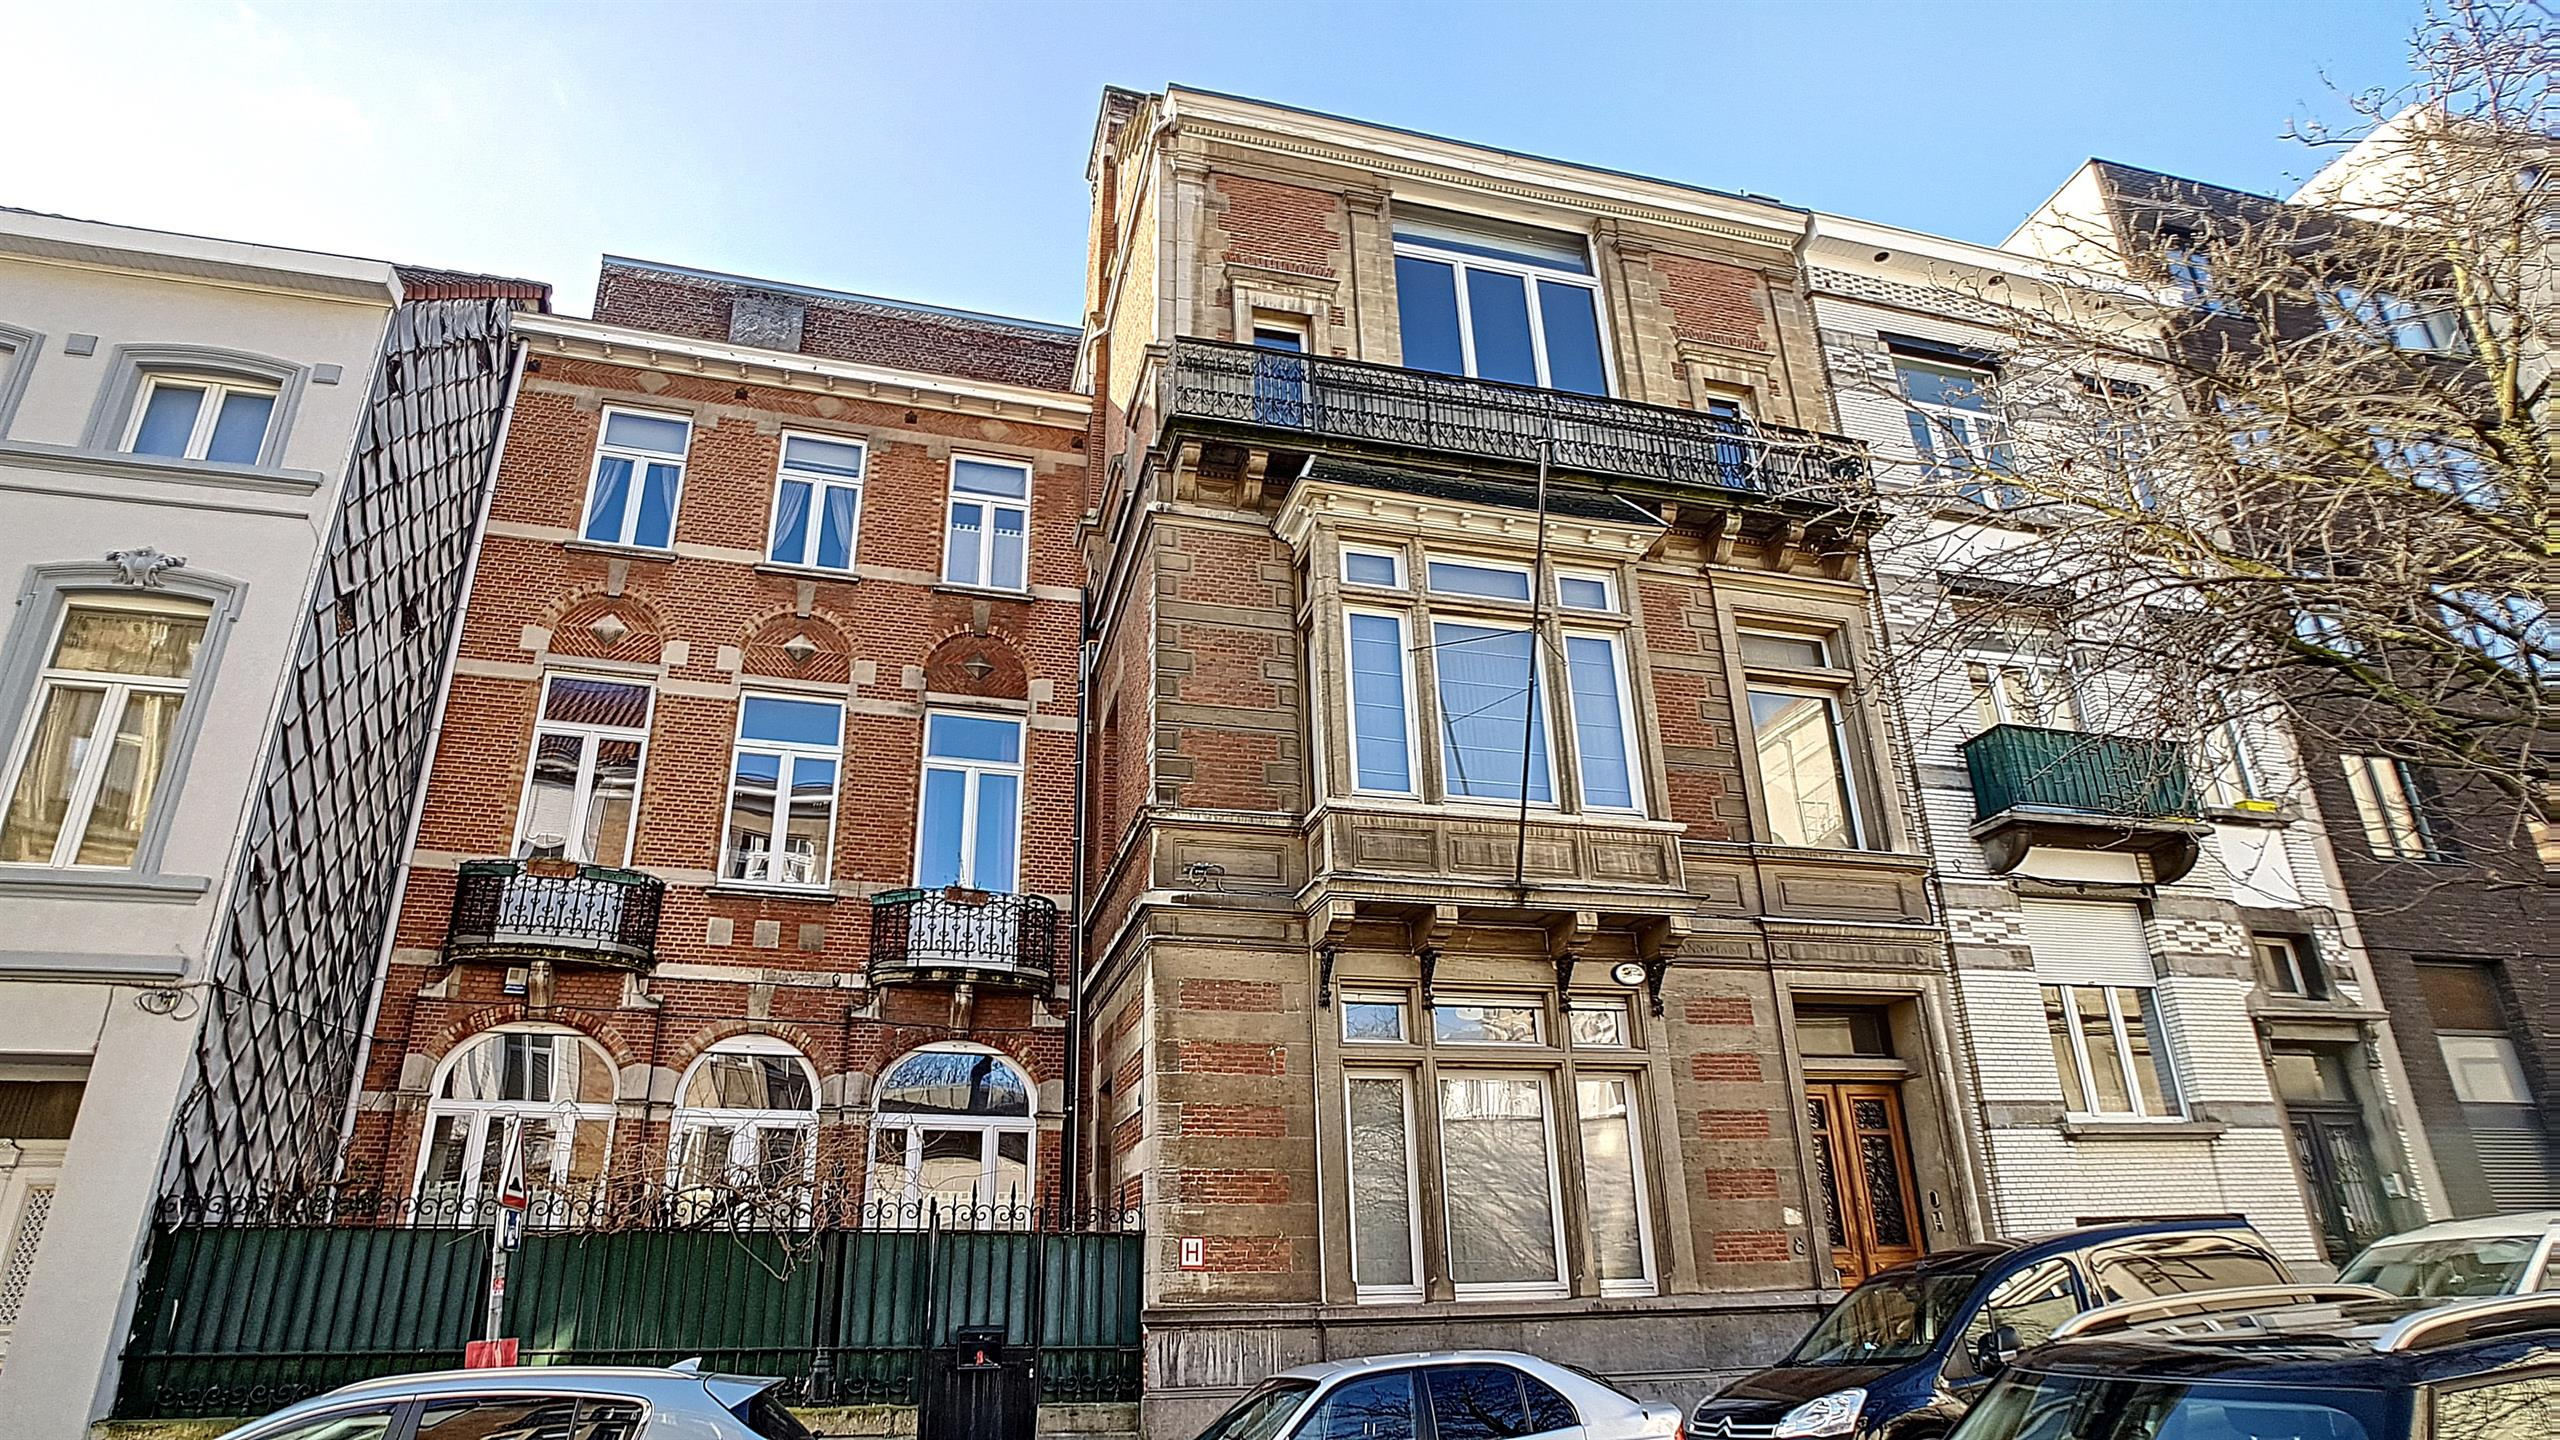 Maison de maitre - Schaerbeek - #4318566-1